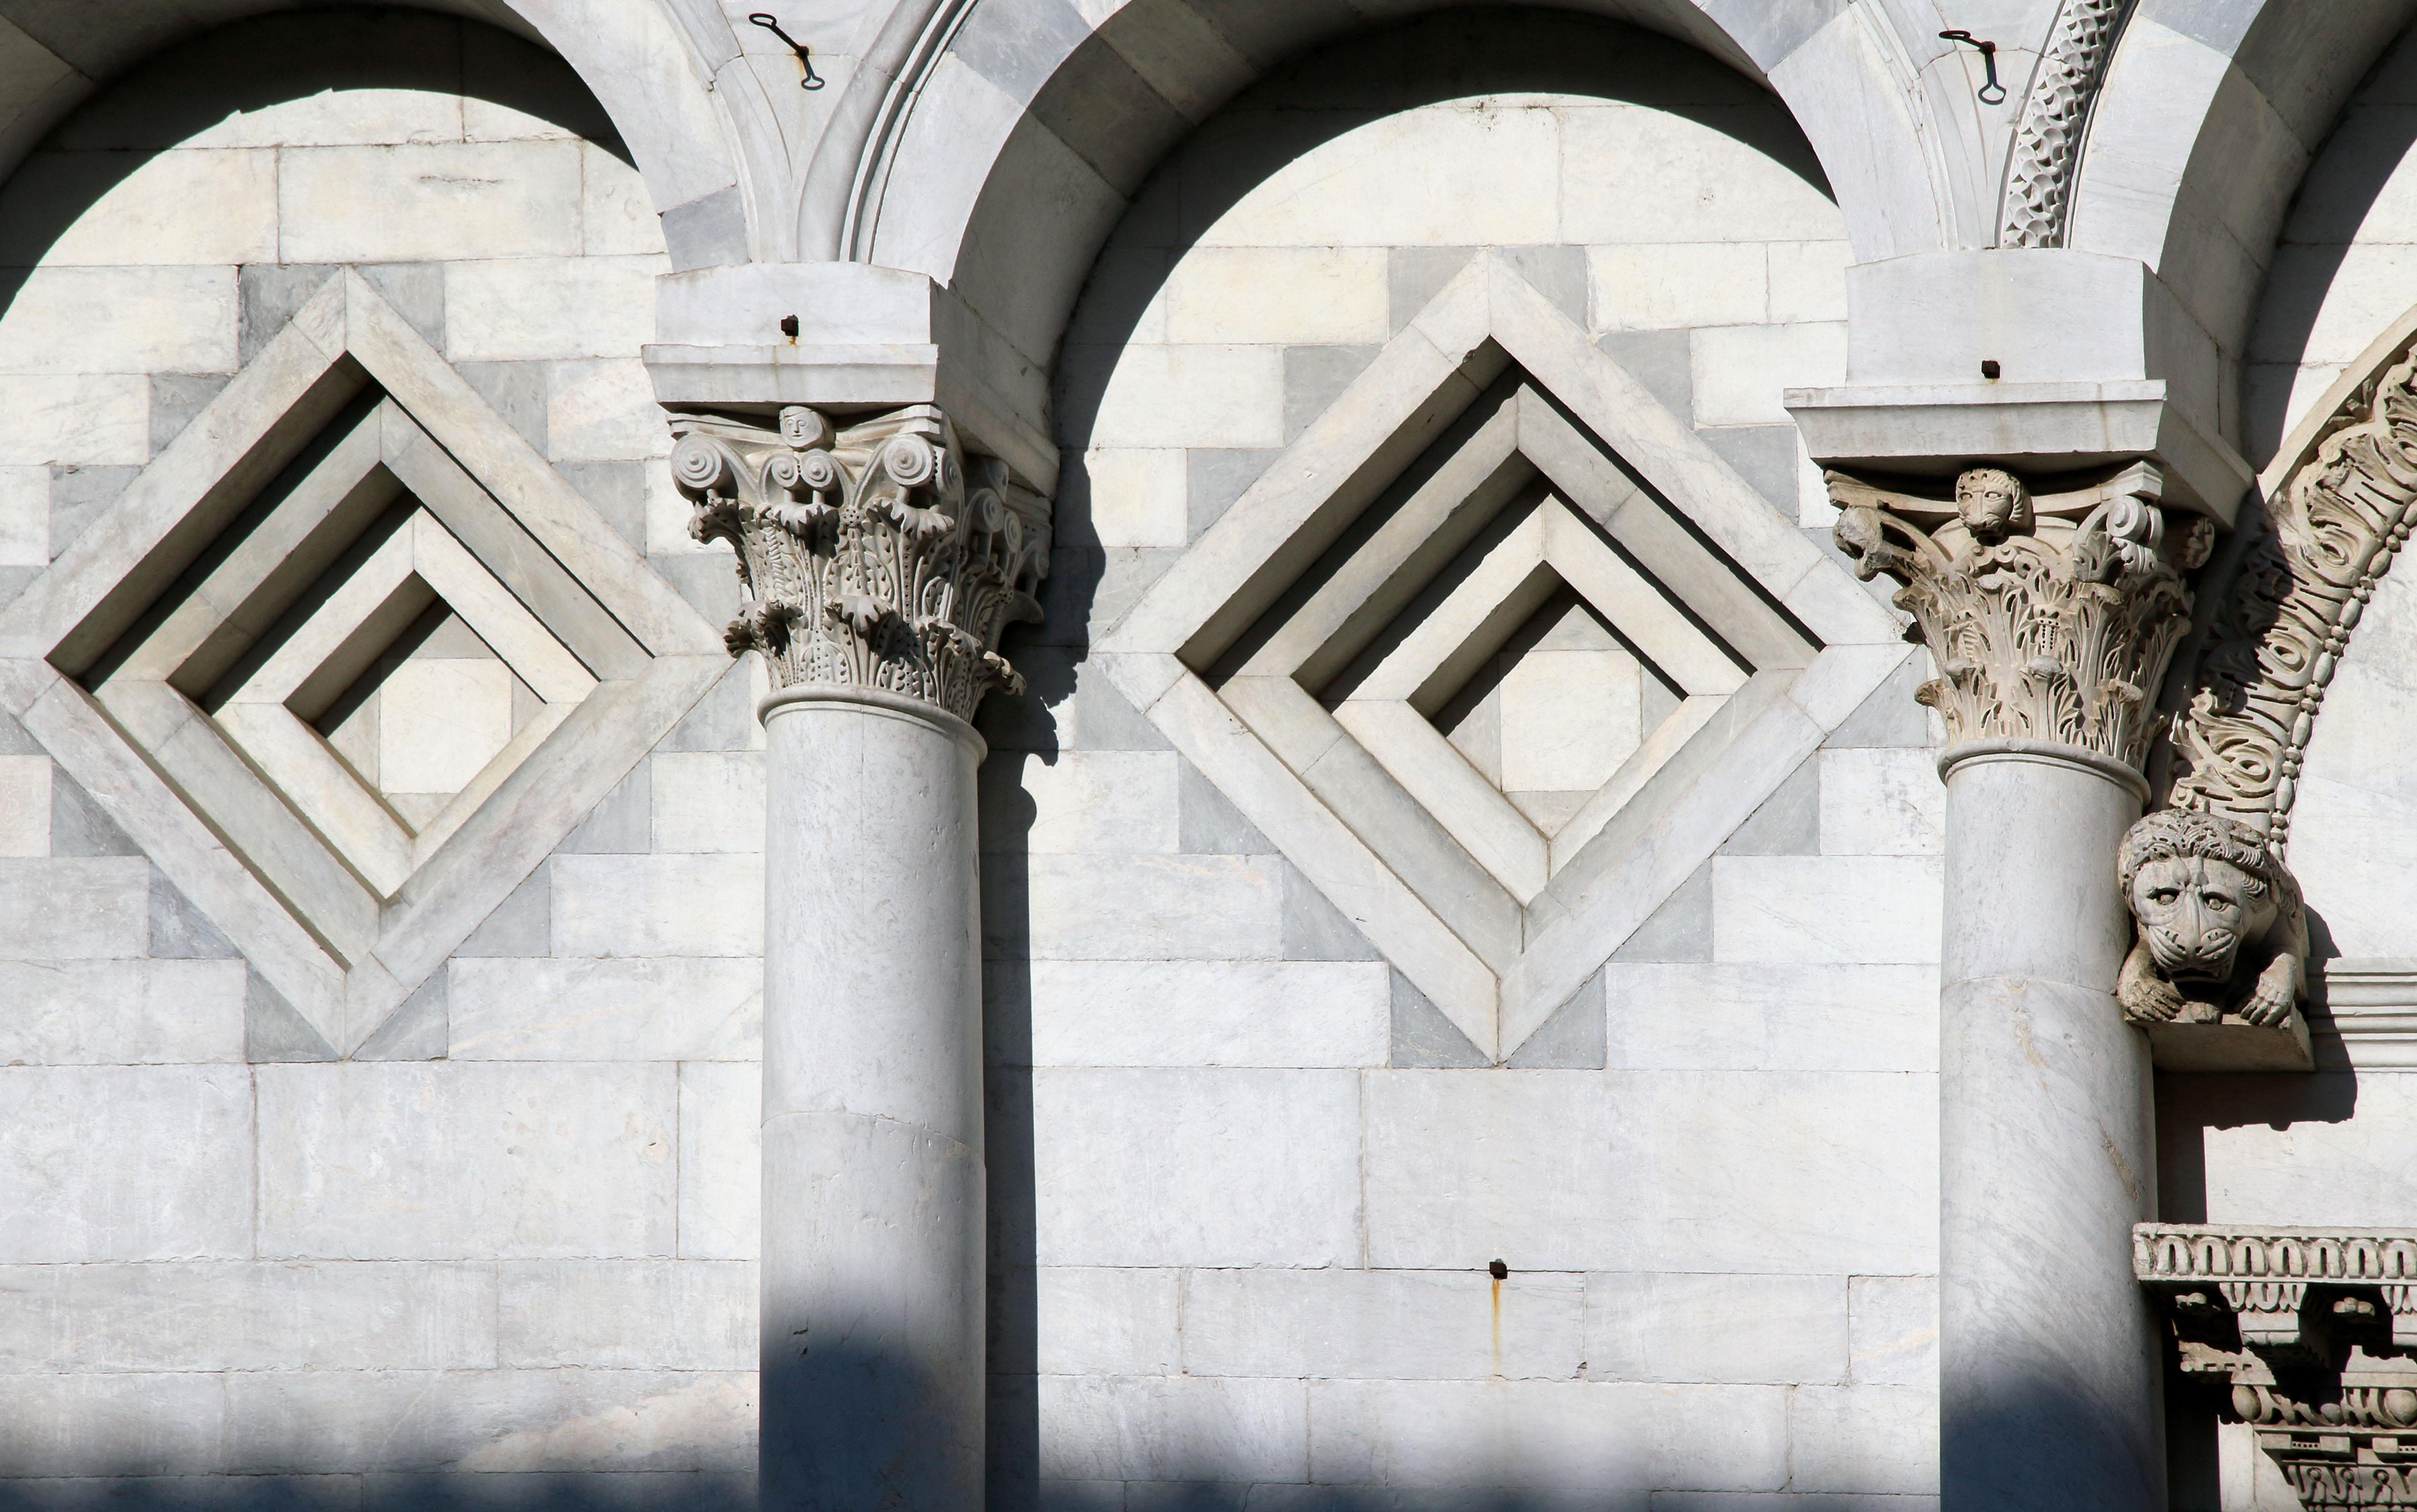 dettagli architettonici